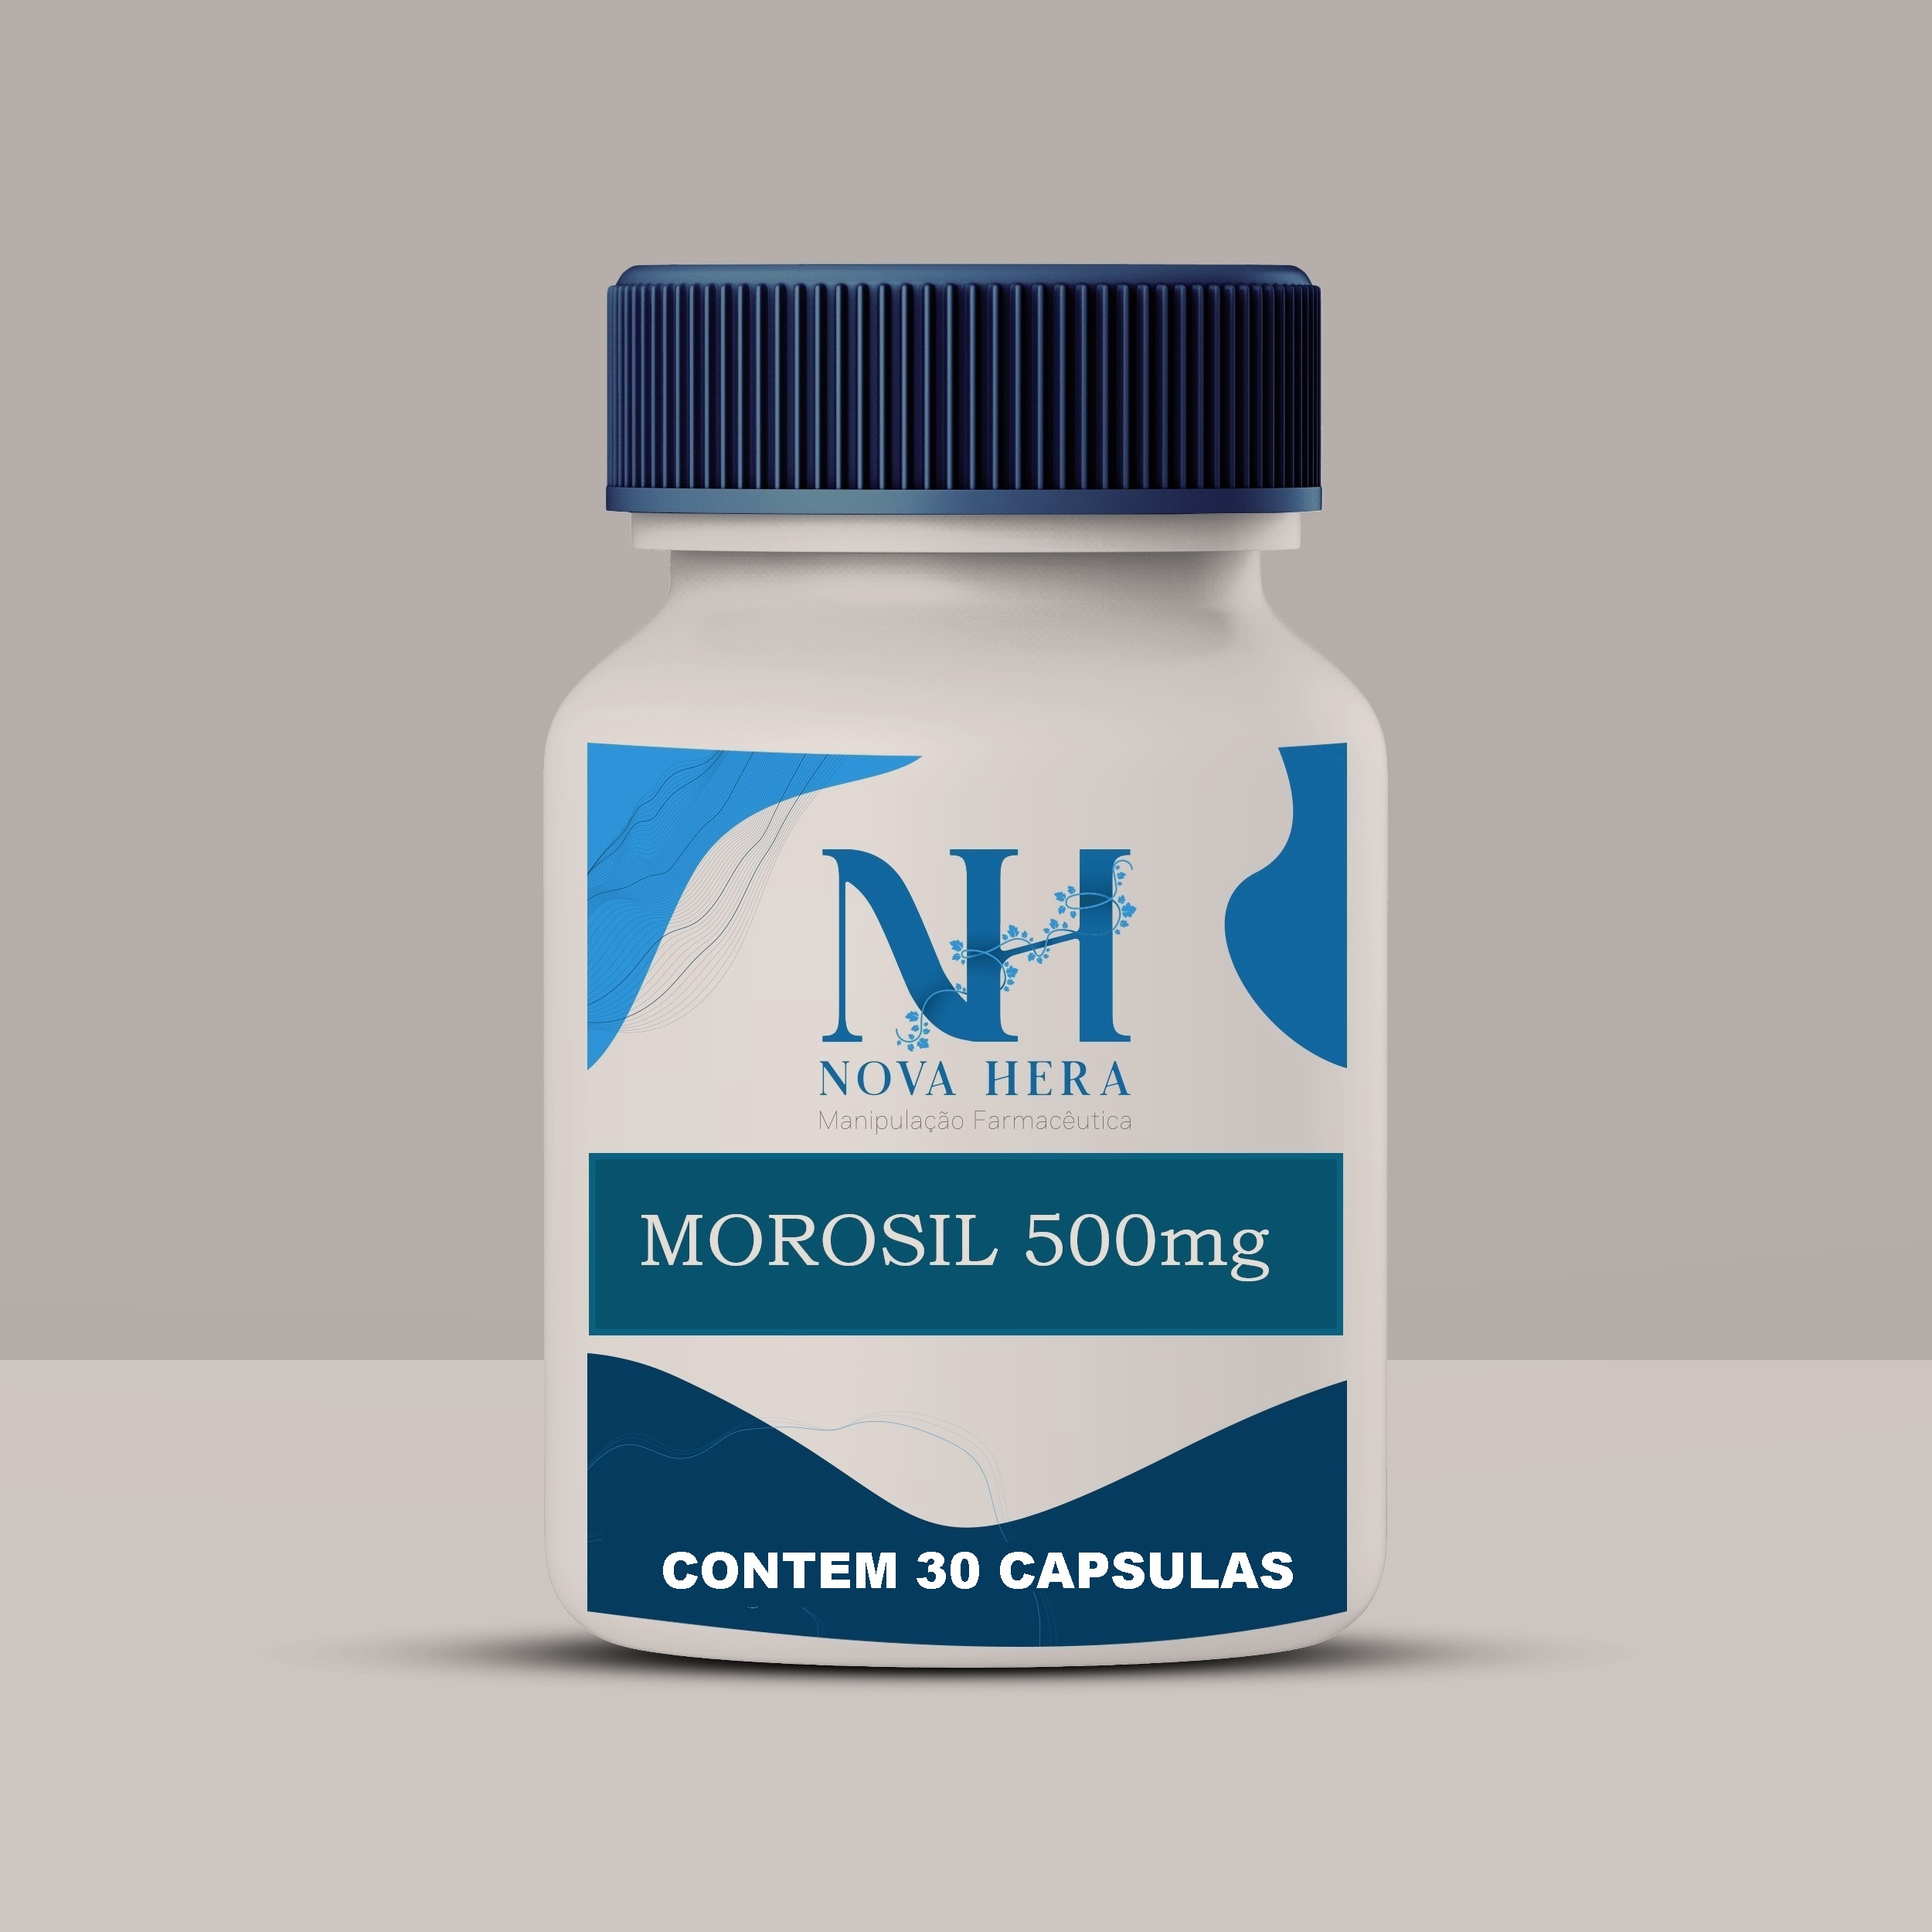 https://www.farmacianovahera.com.br/view/_upload/produto/44/1595015425morosil---jpeg---30-capsulas.jpg